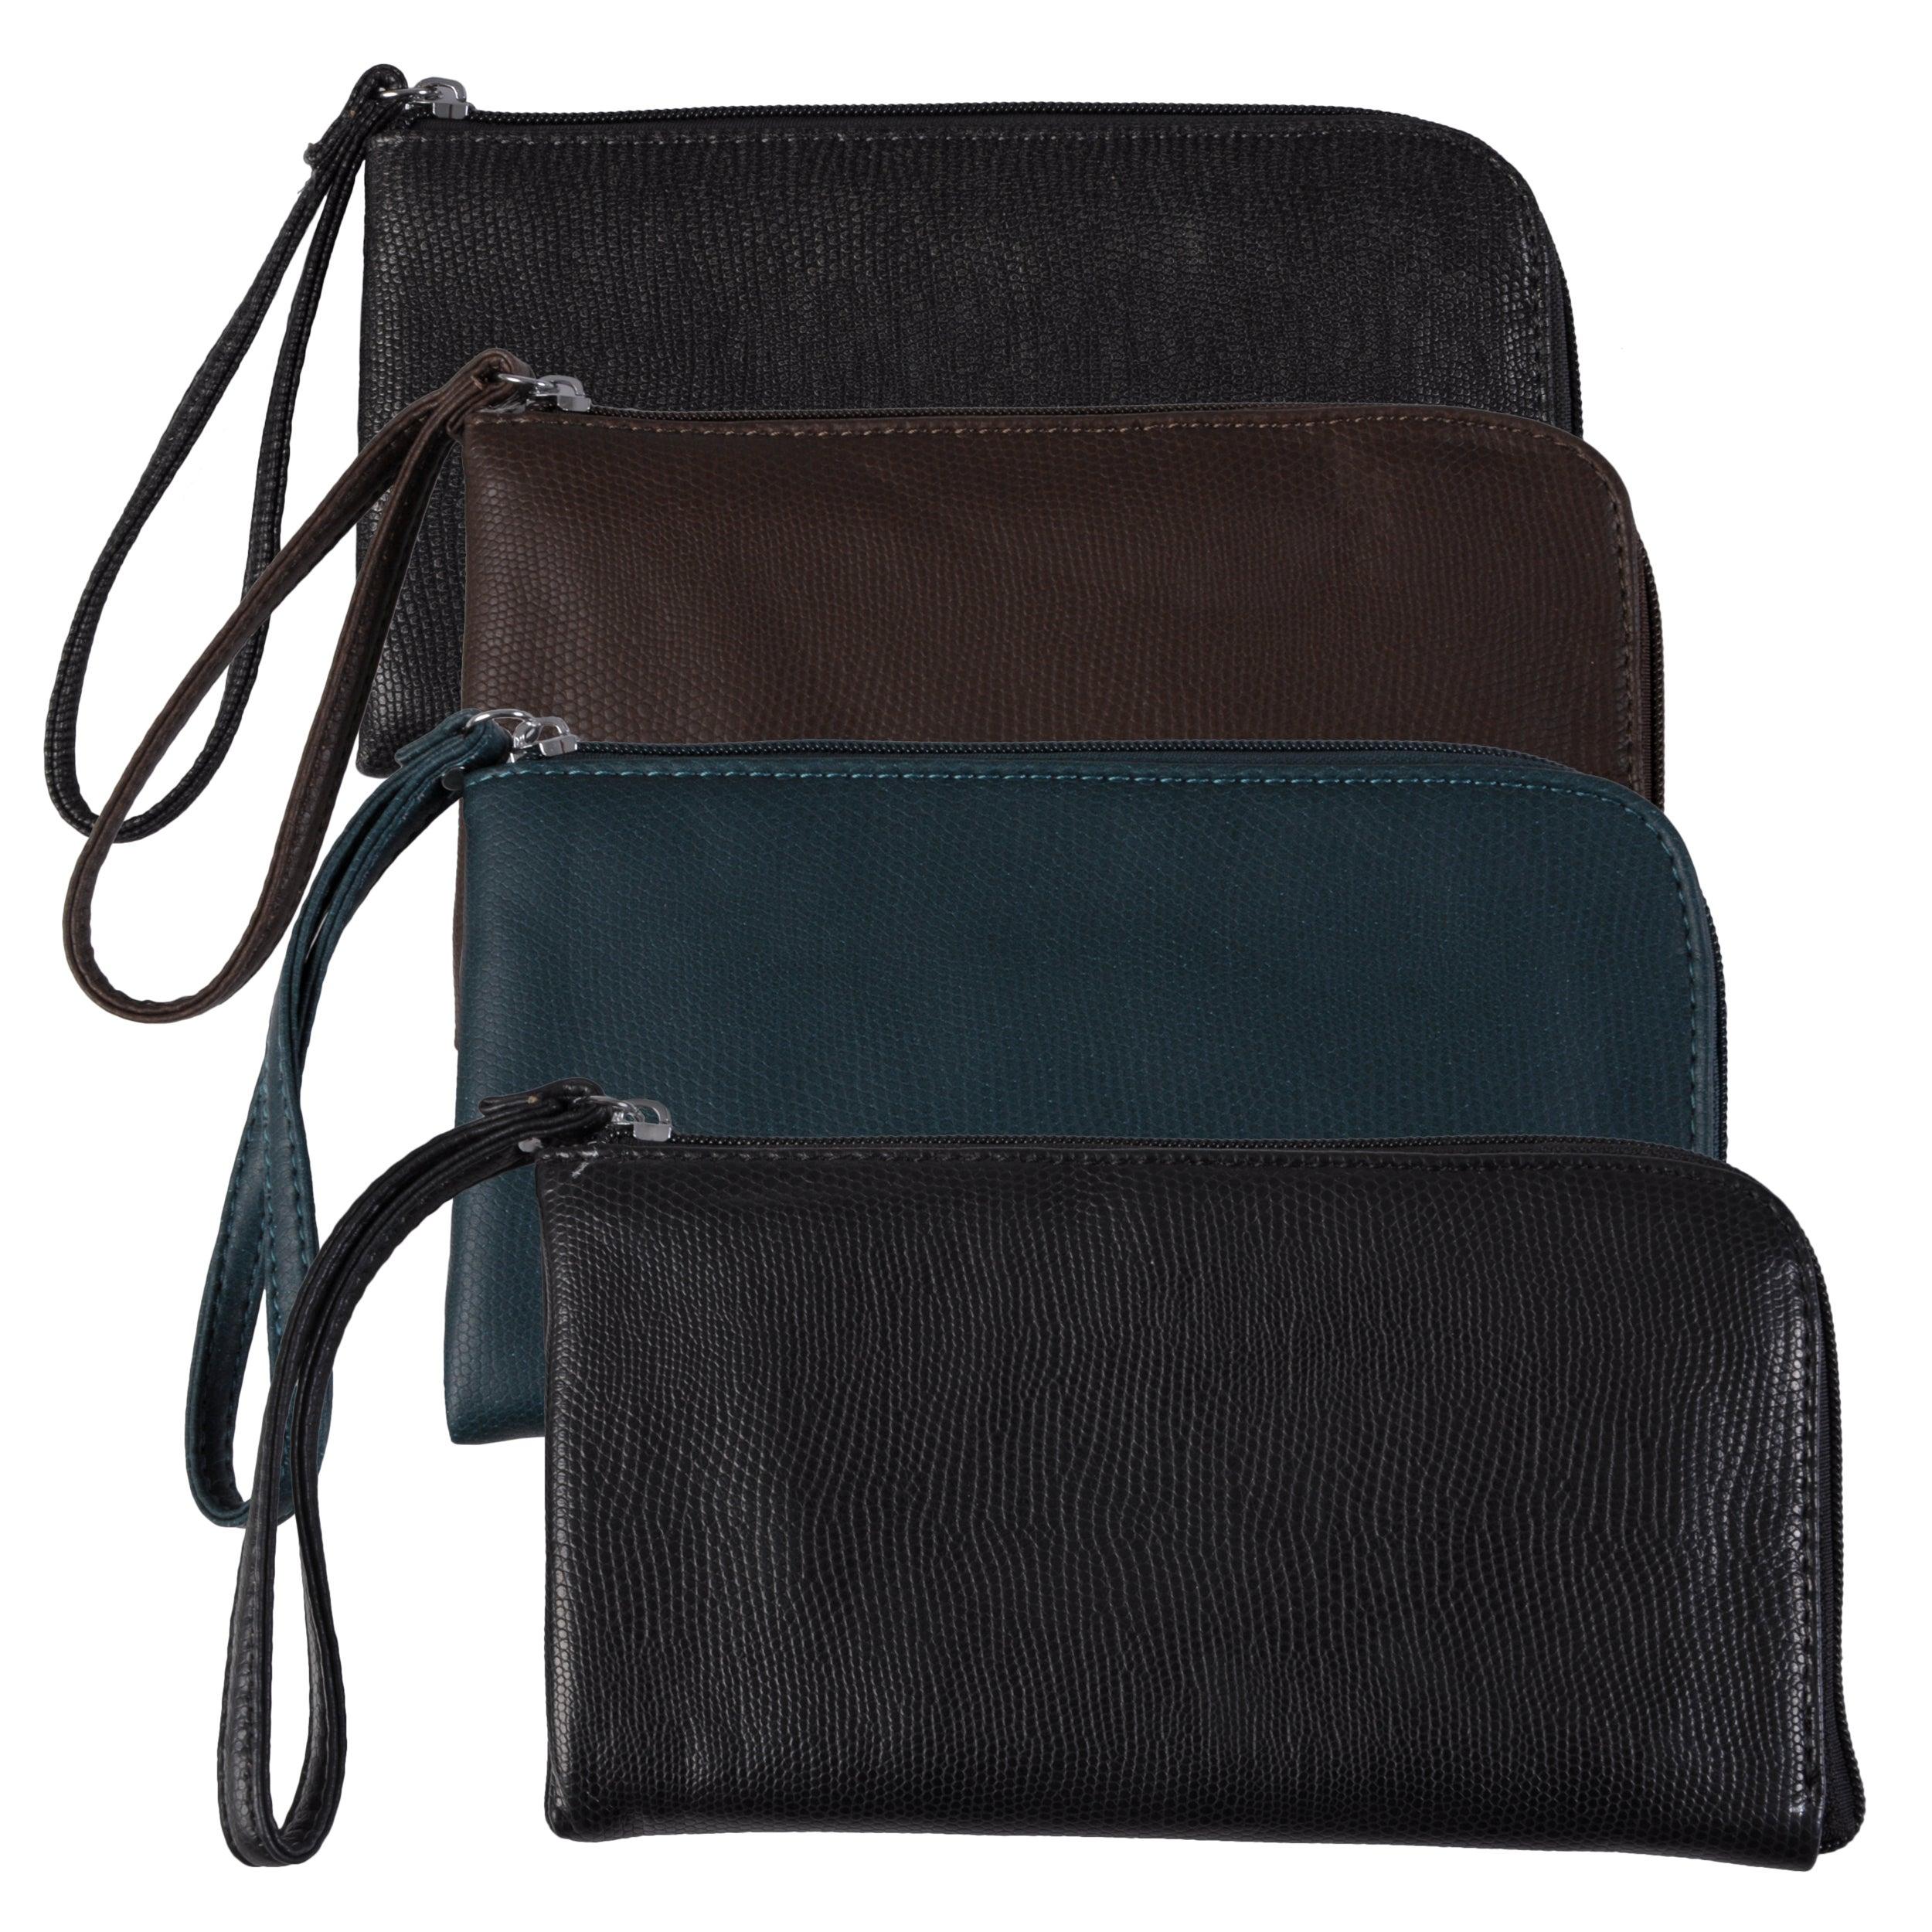 Adi Designs Women's Zippered Textured Wristlet Wallet